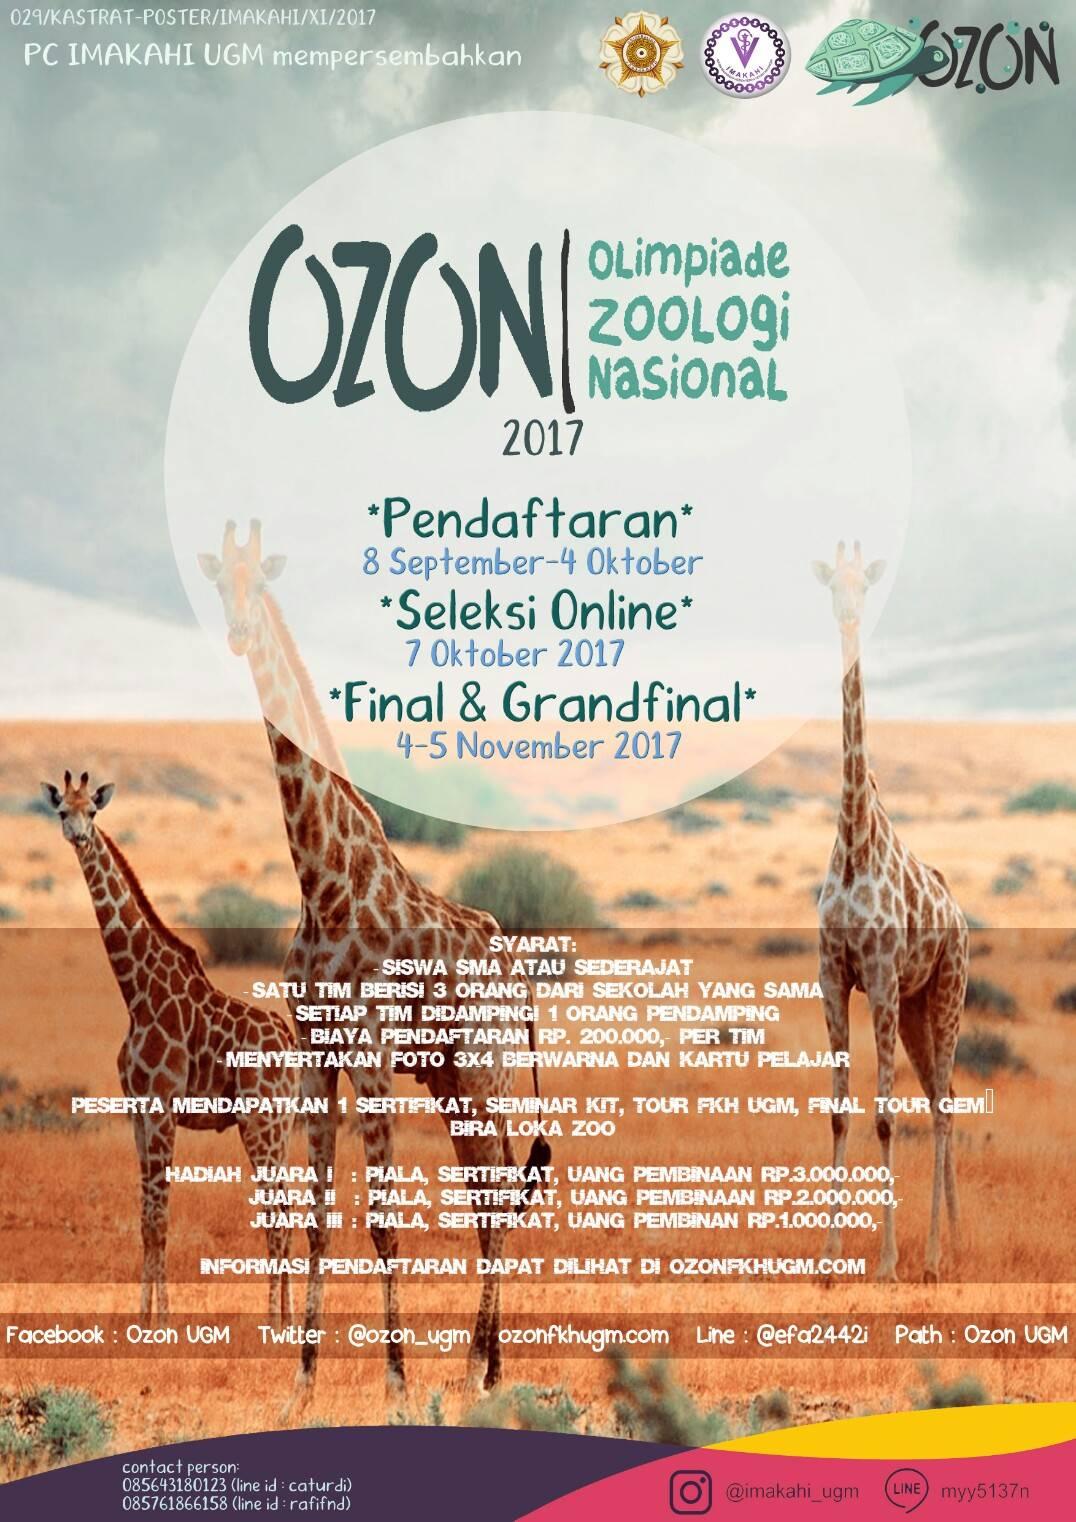 Olimpiade Zoologi Nasional 2017 | Univ. Gadjah Mada | SMA Sederajat